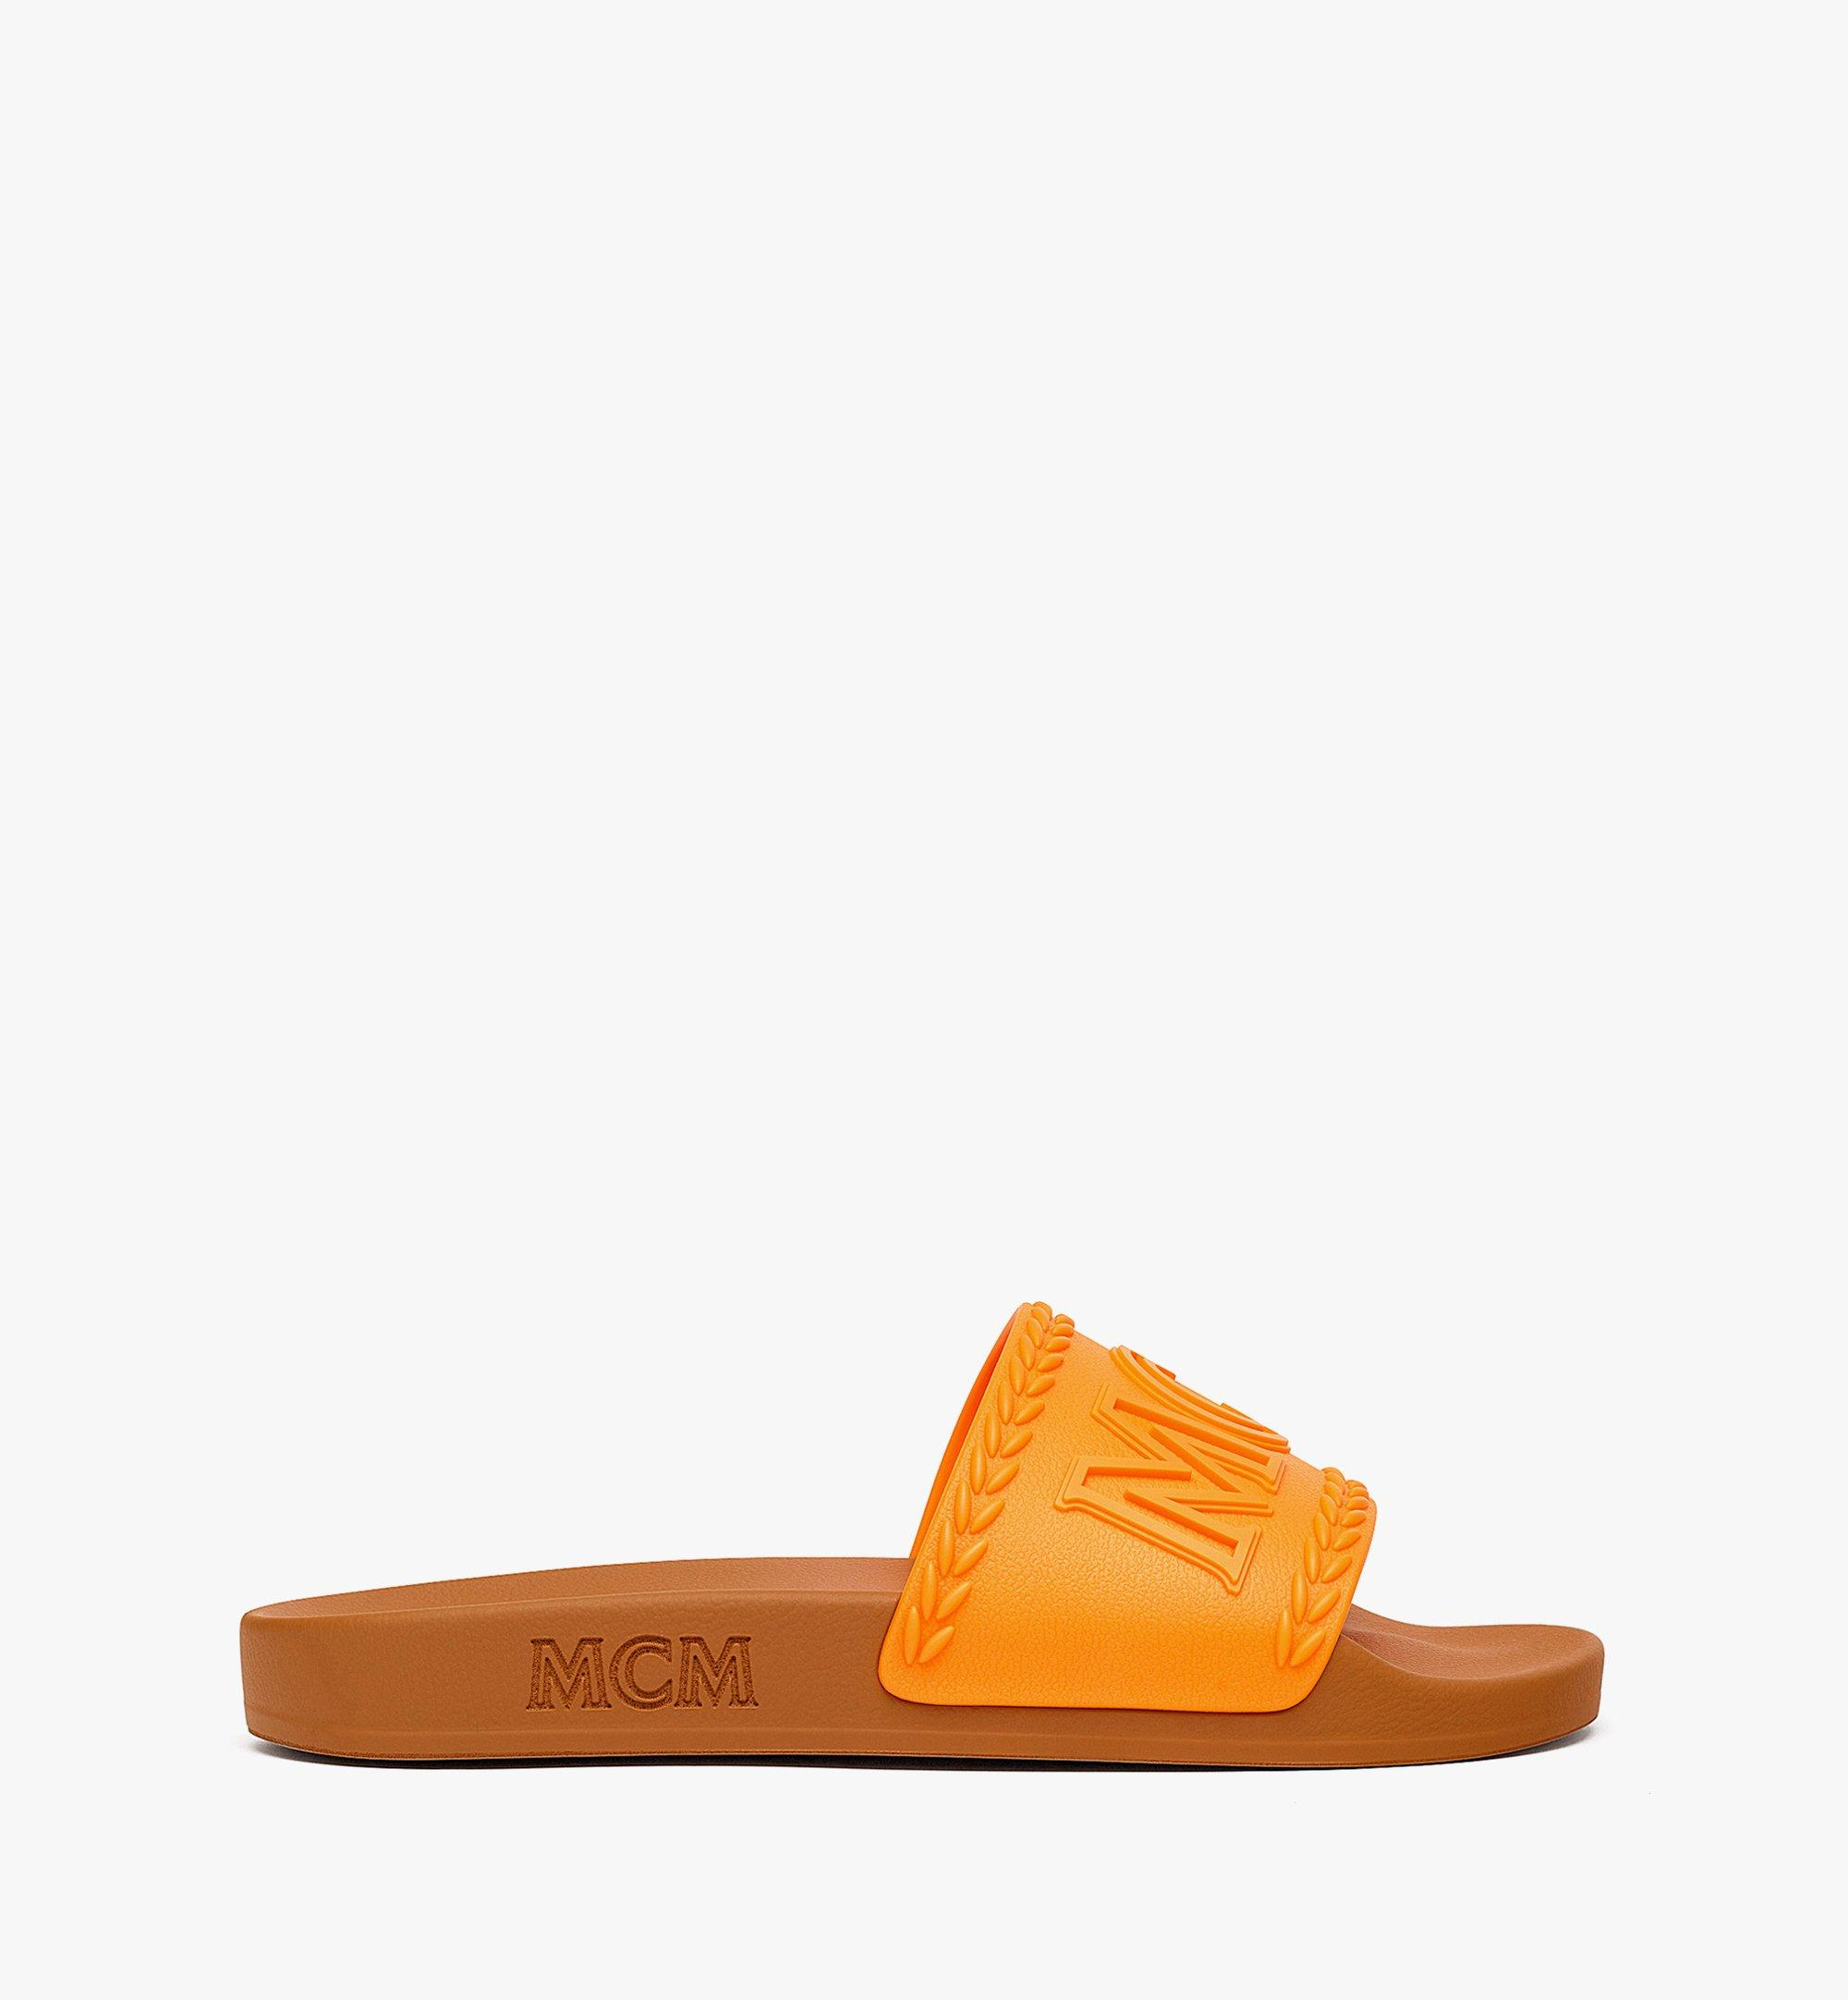 MCM 女士 Big Logo 橡膠拖鞋 Orange MESBSMM15O9036 更多視圖 3